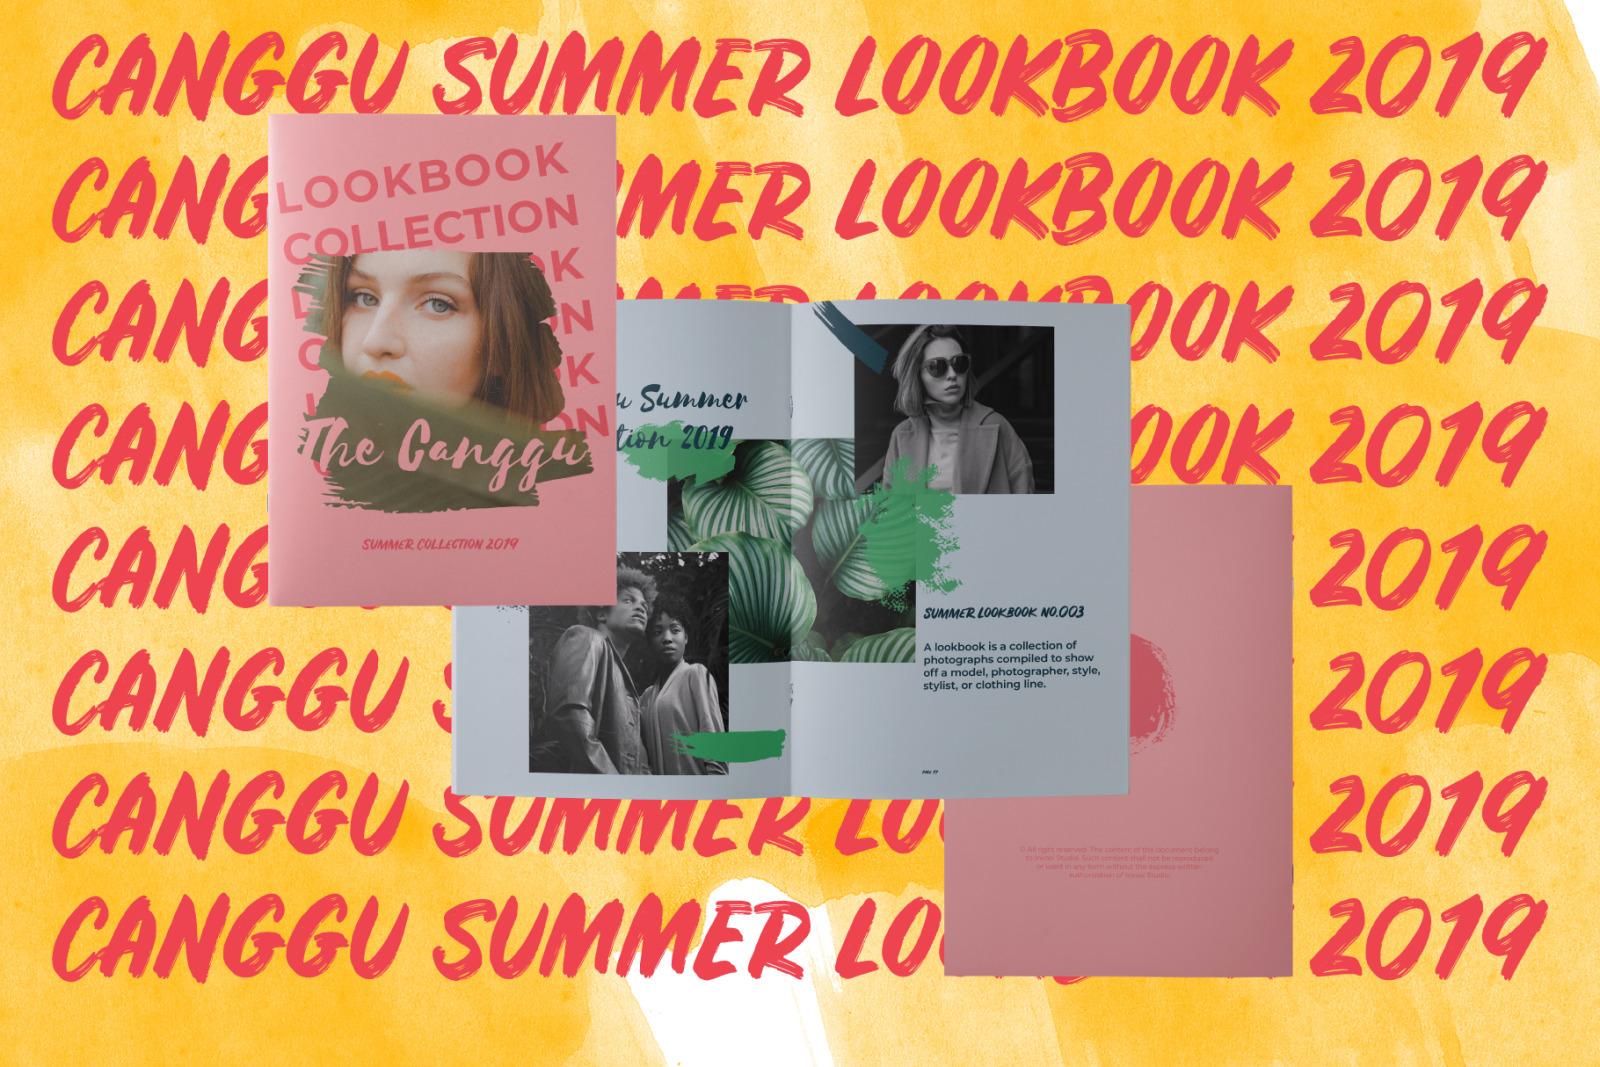 CANGGU-Tropical Lookbook Editorial